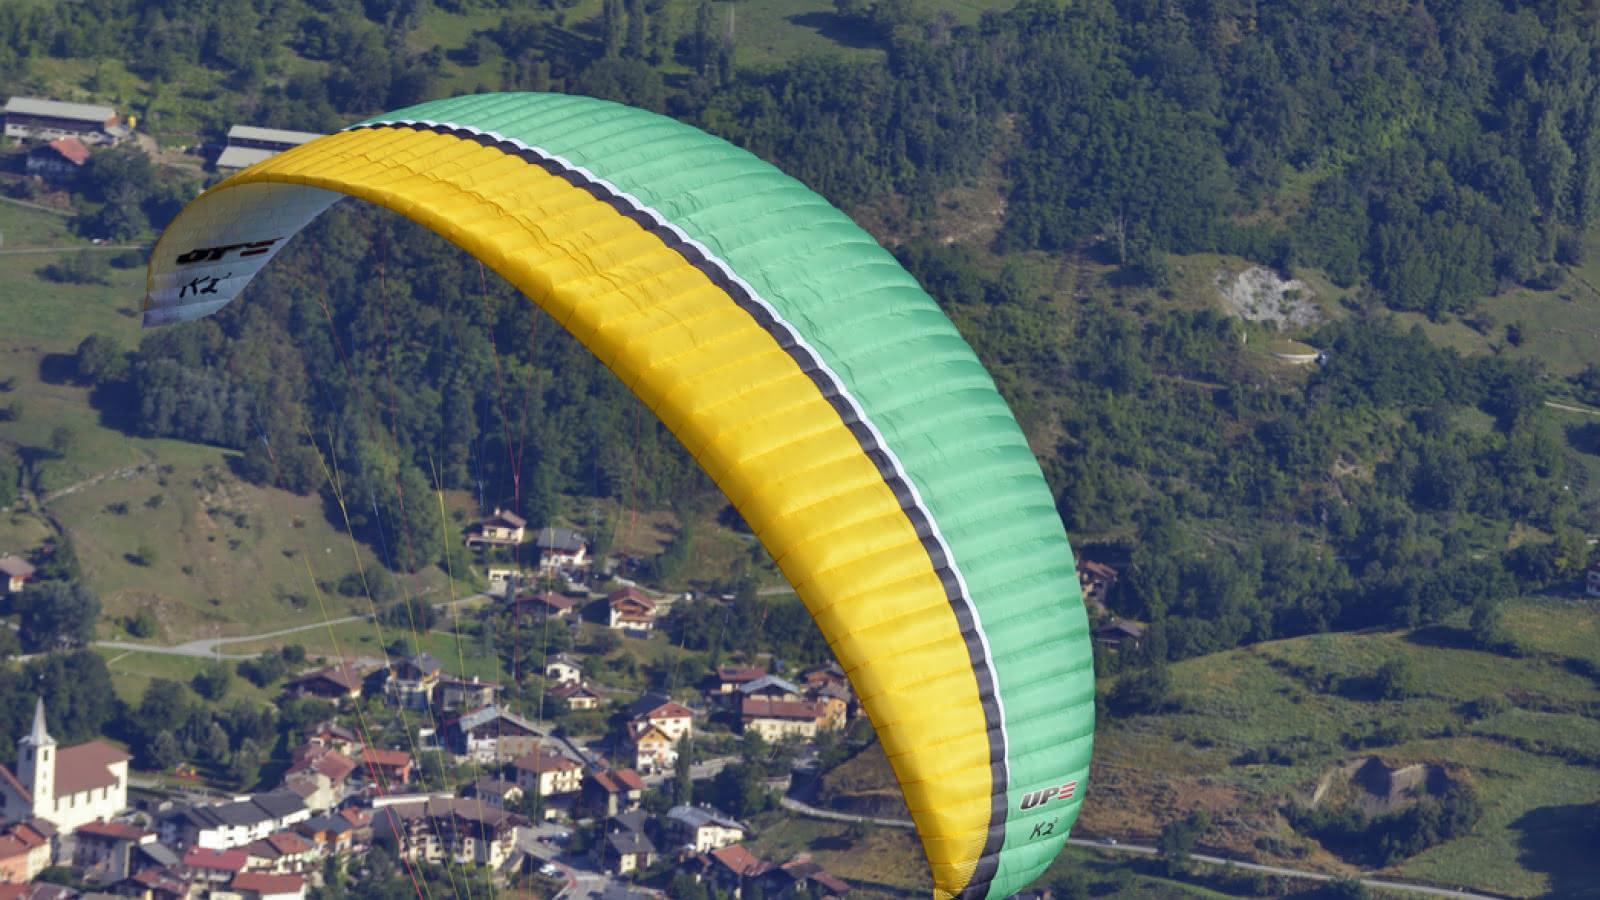 Paragliding in the valley of La Plagne